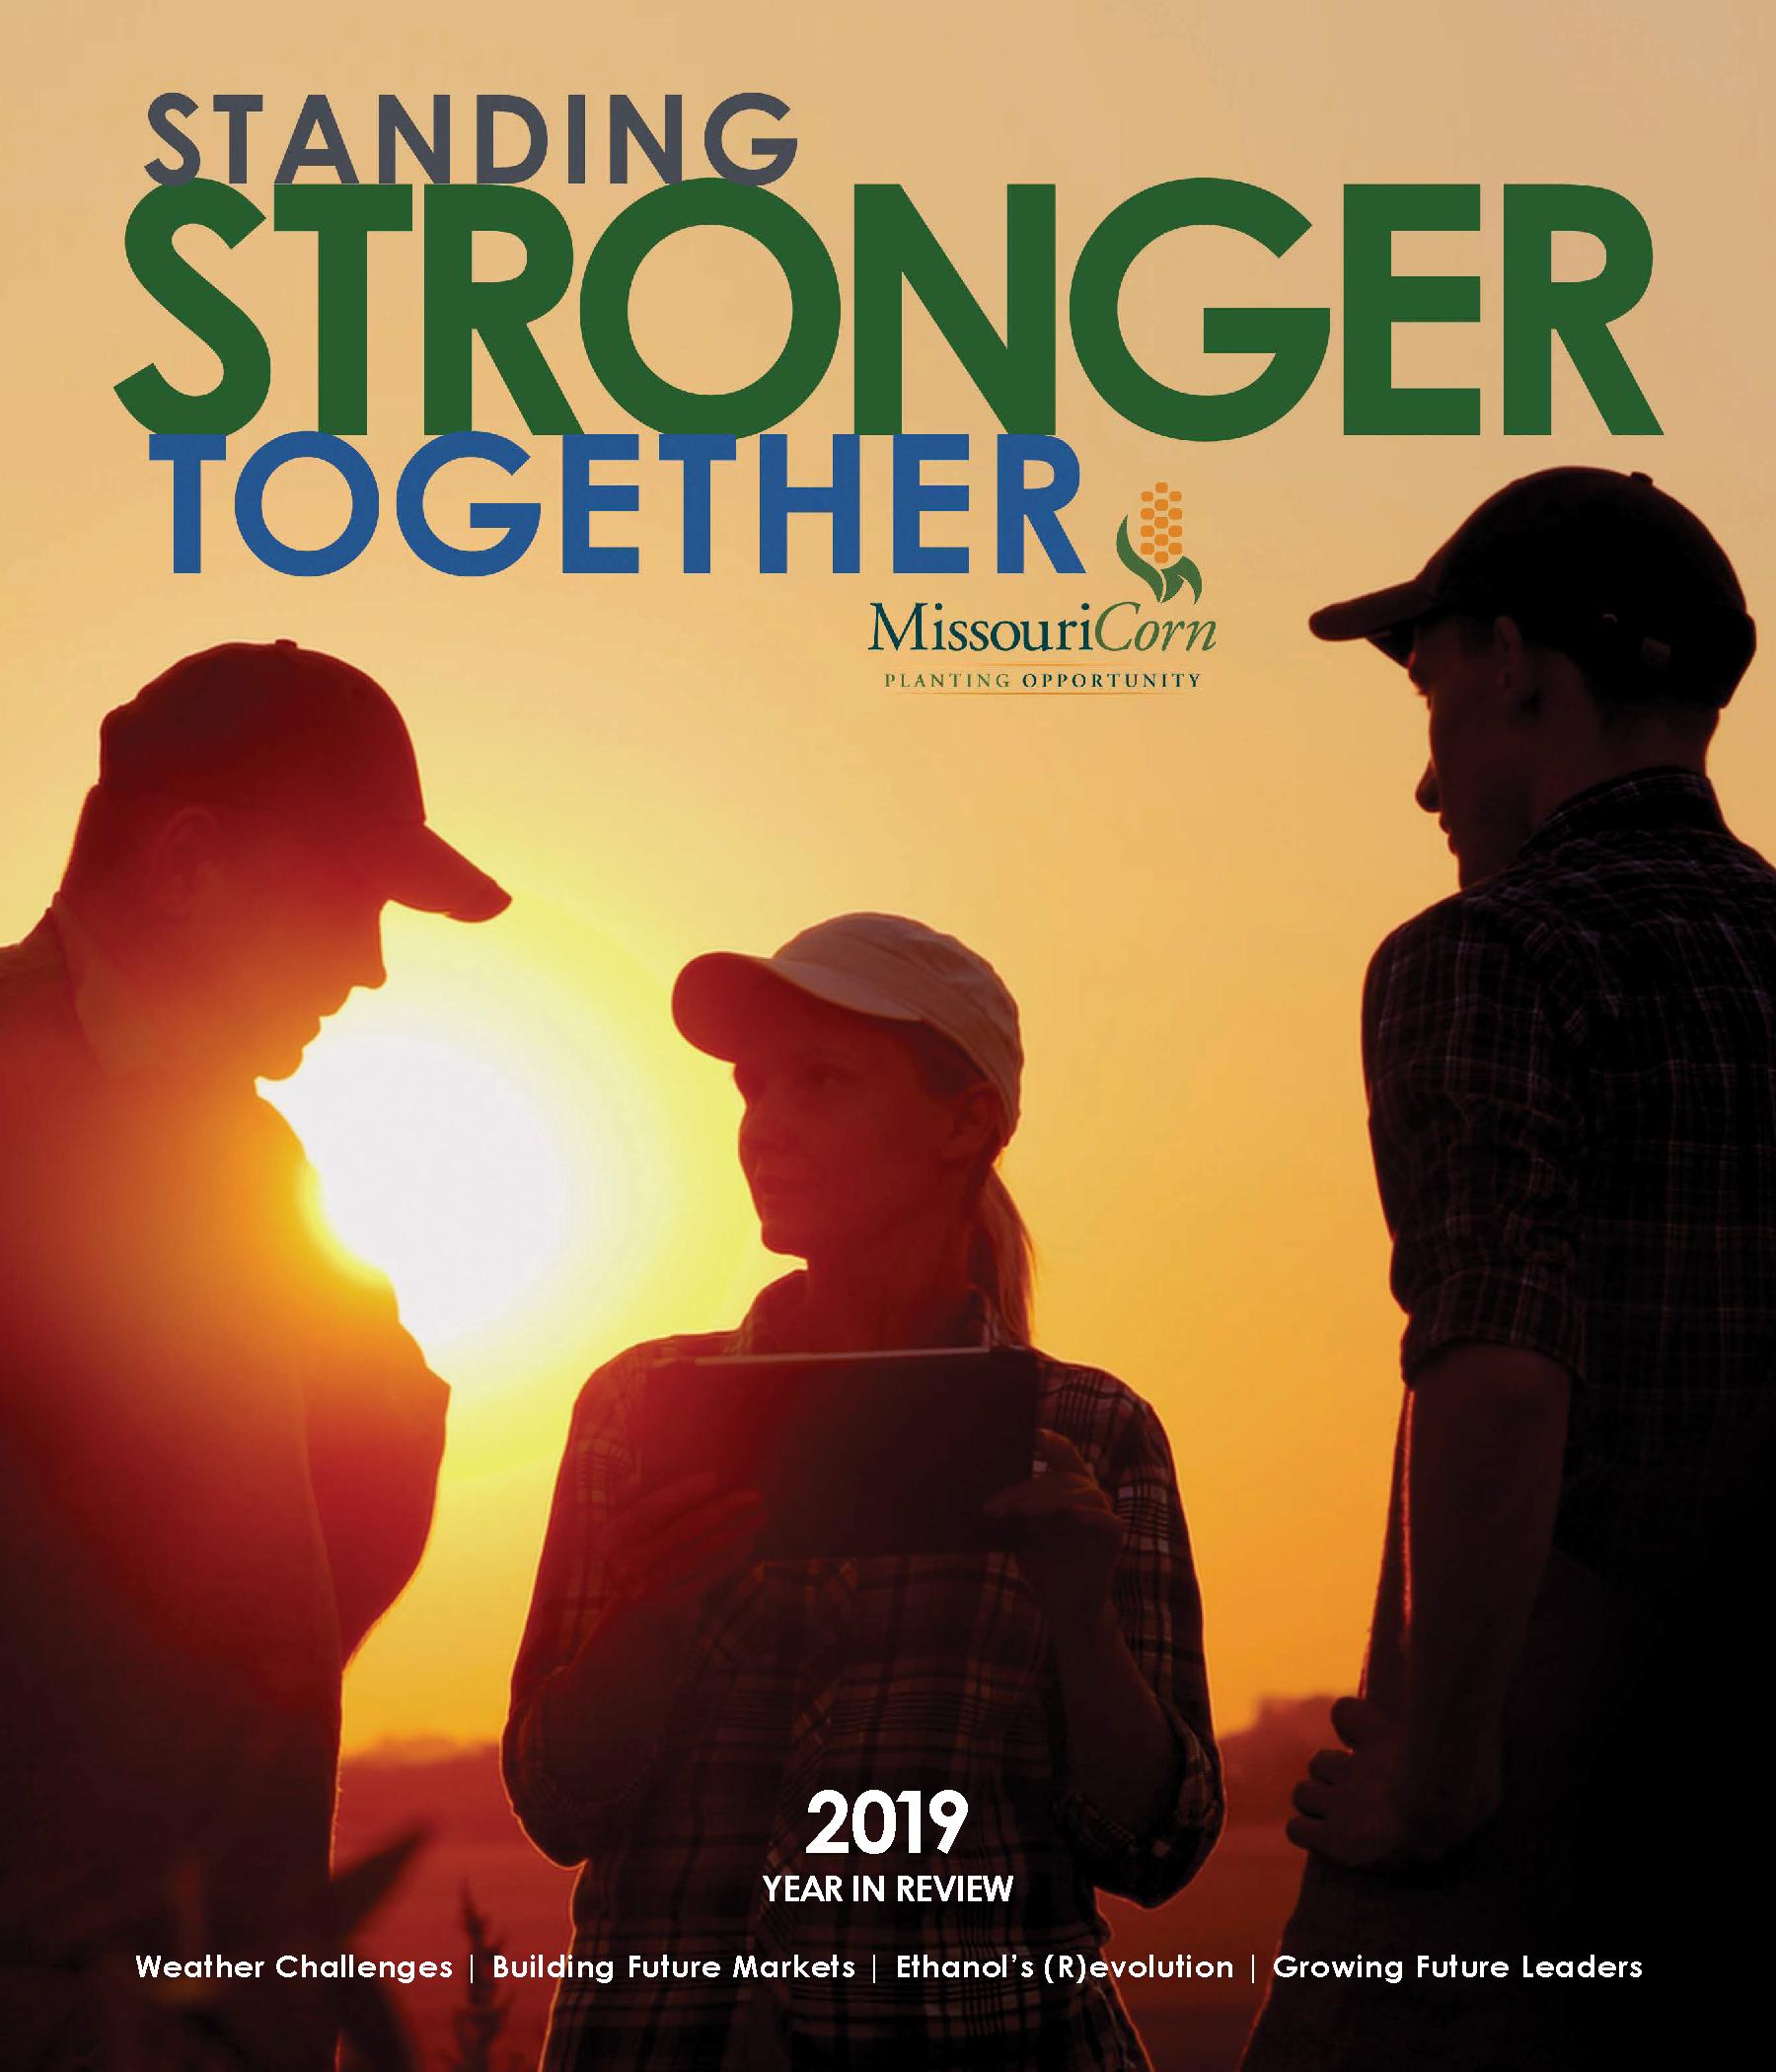 19 Mcga 0200 2019 Annual Report Final 1